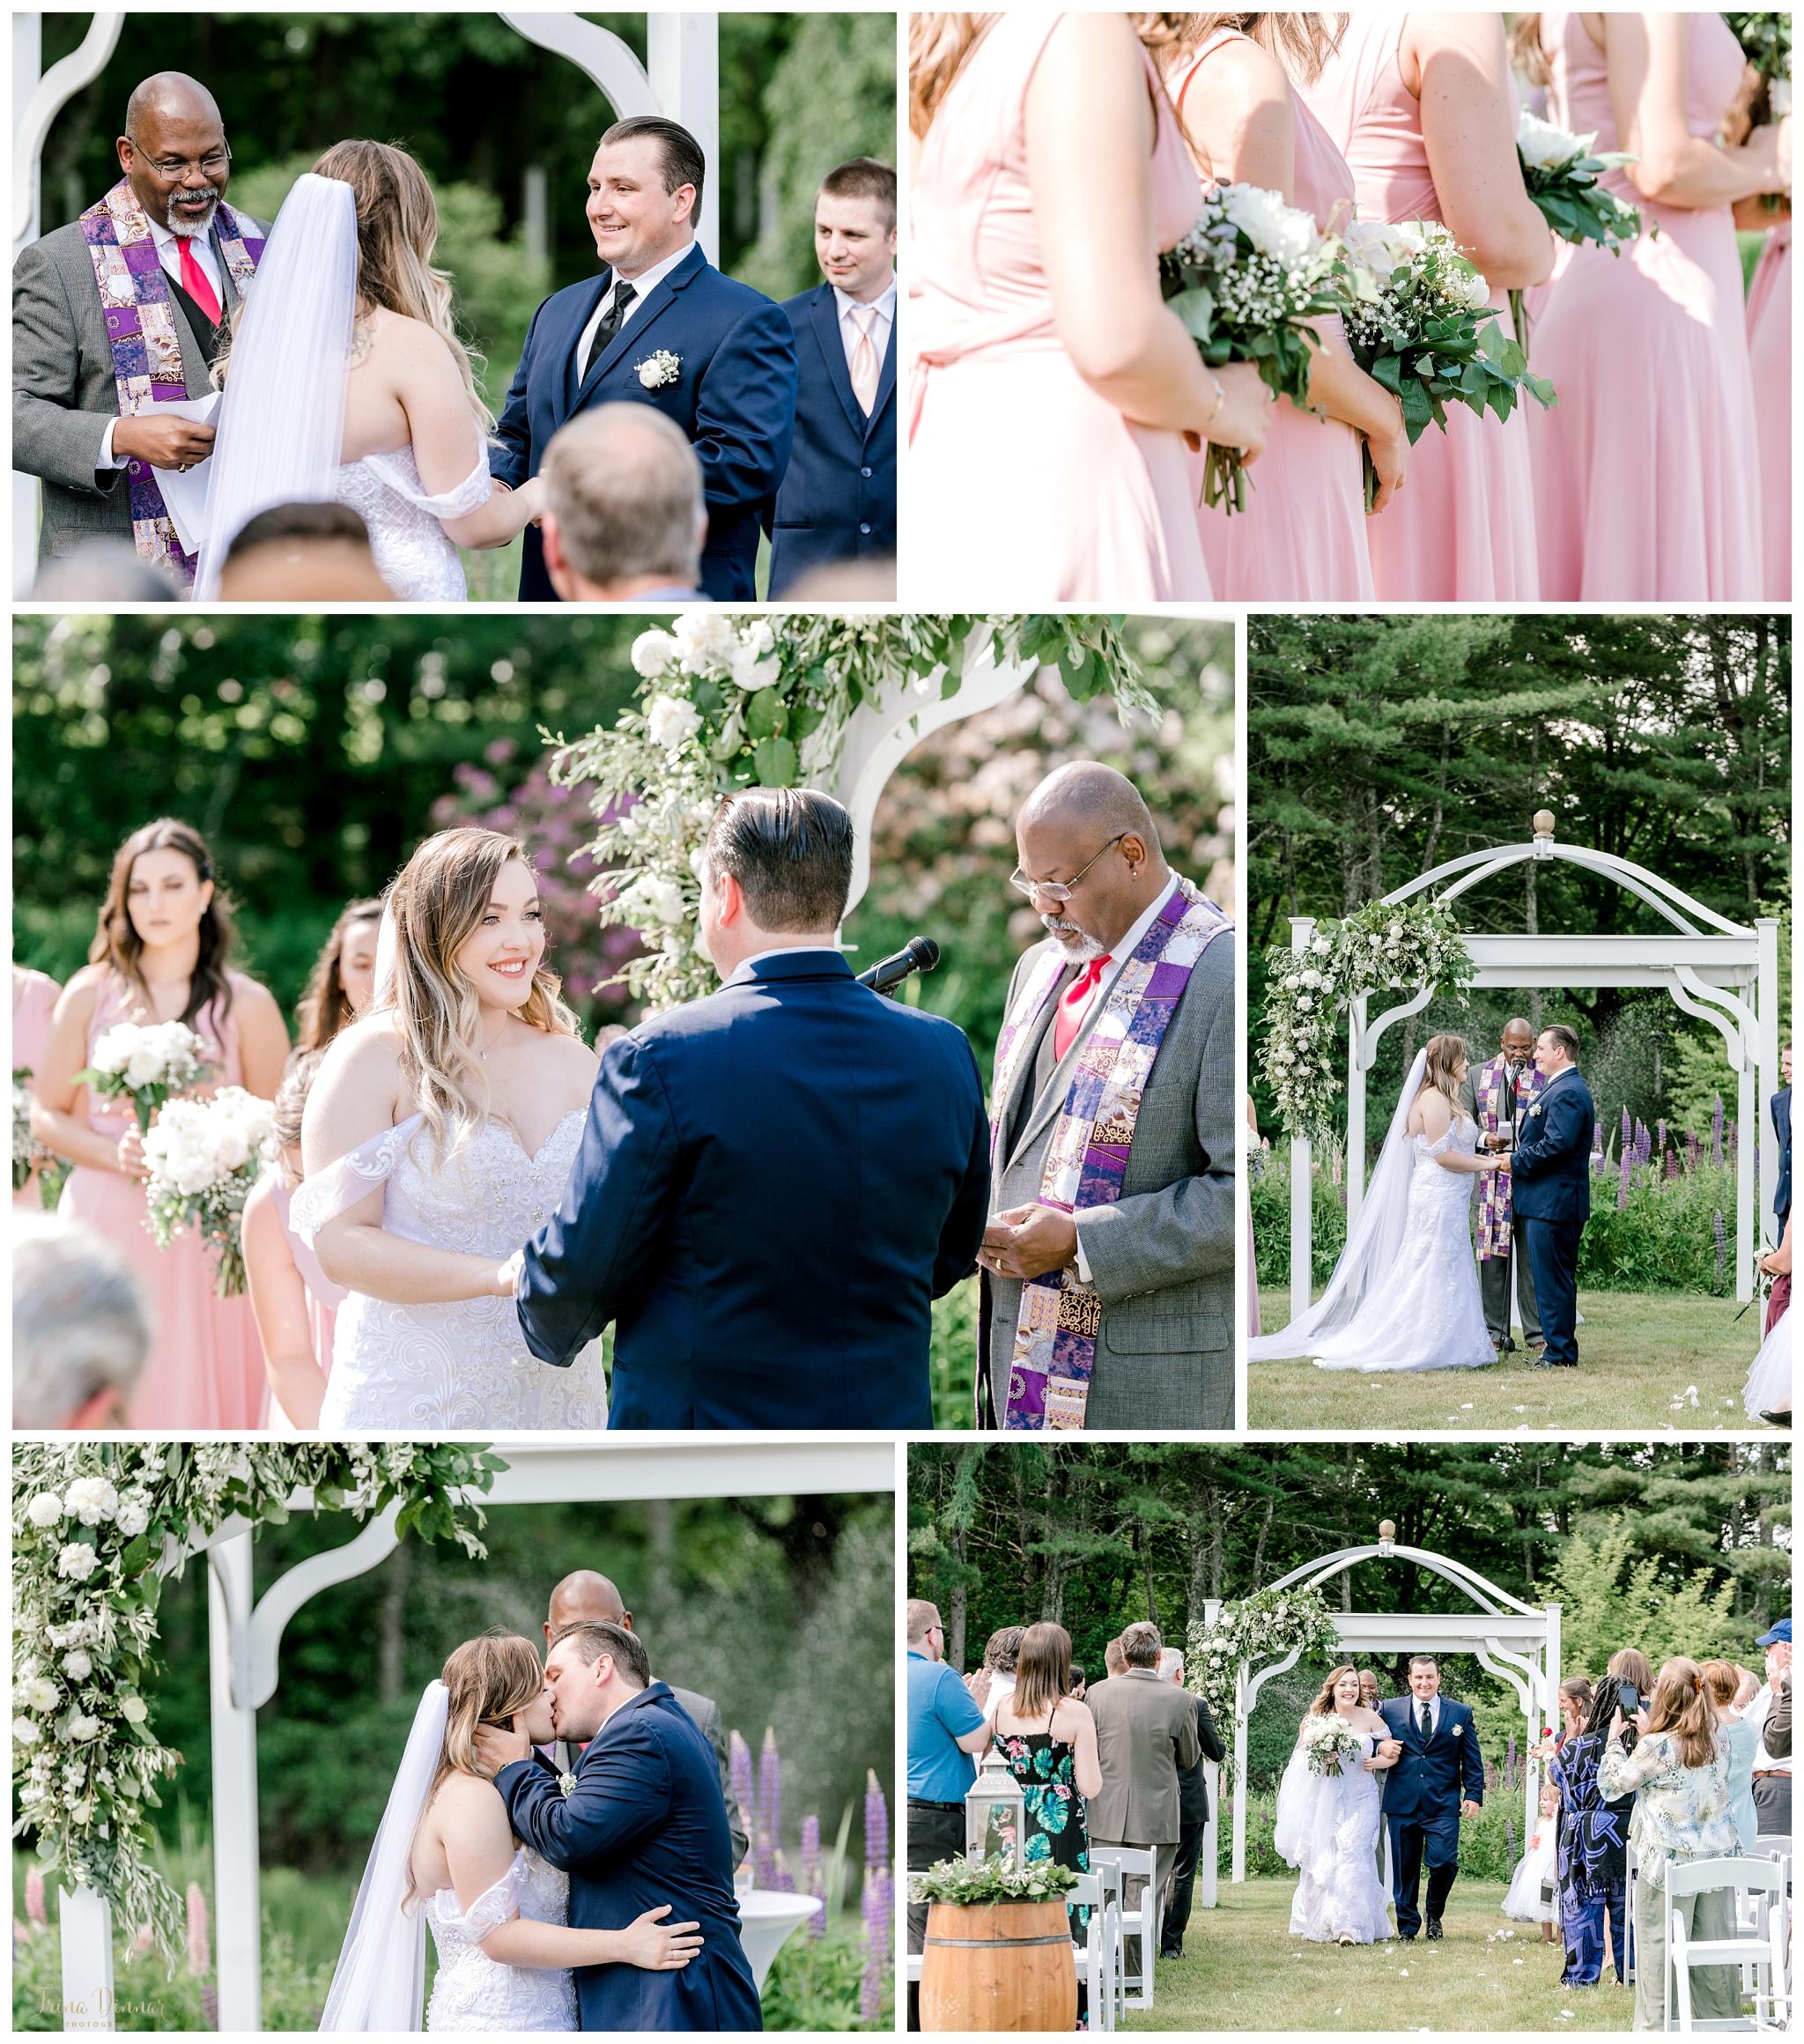 Outdoor Maine Wedding Ceremony in Bristol